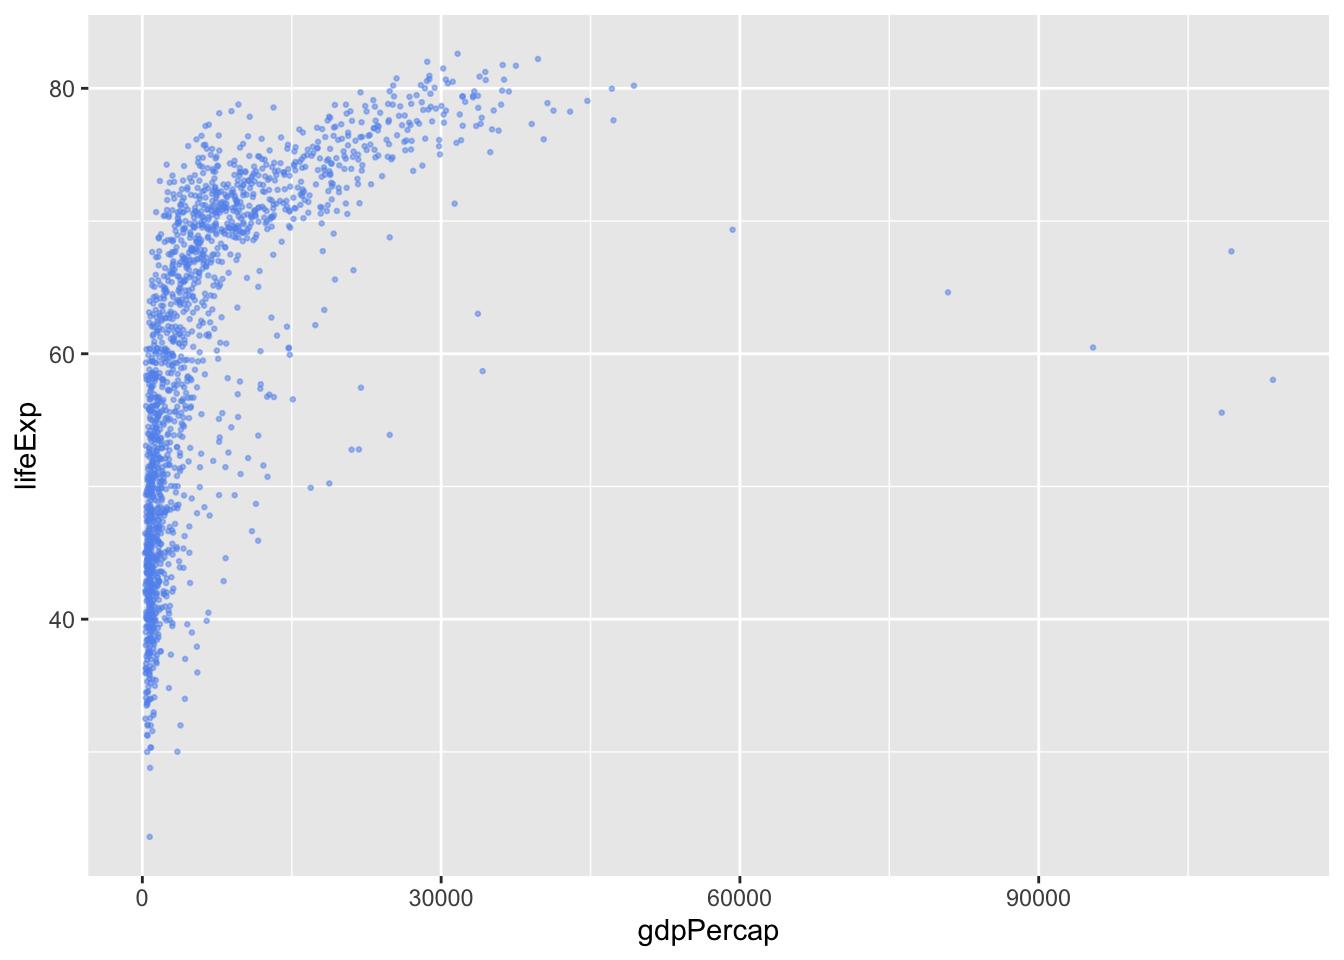 ggplot2: Mastering the basics